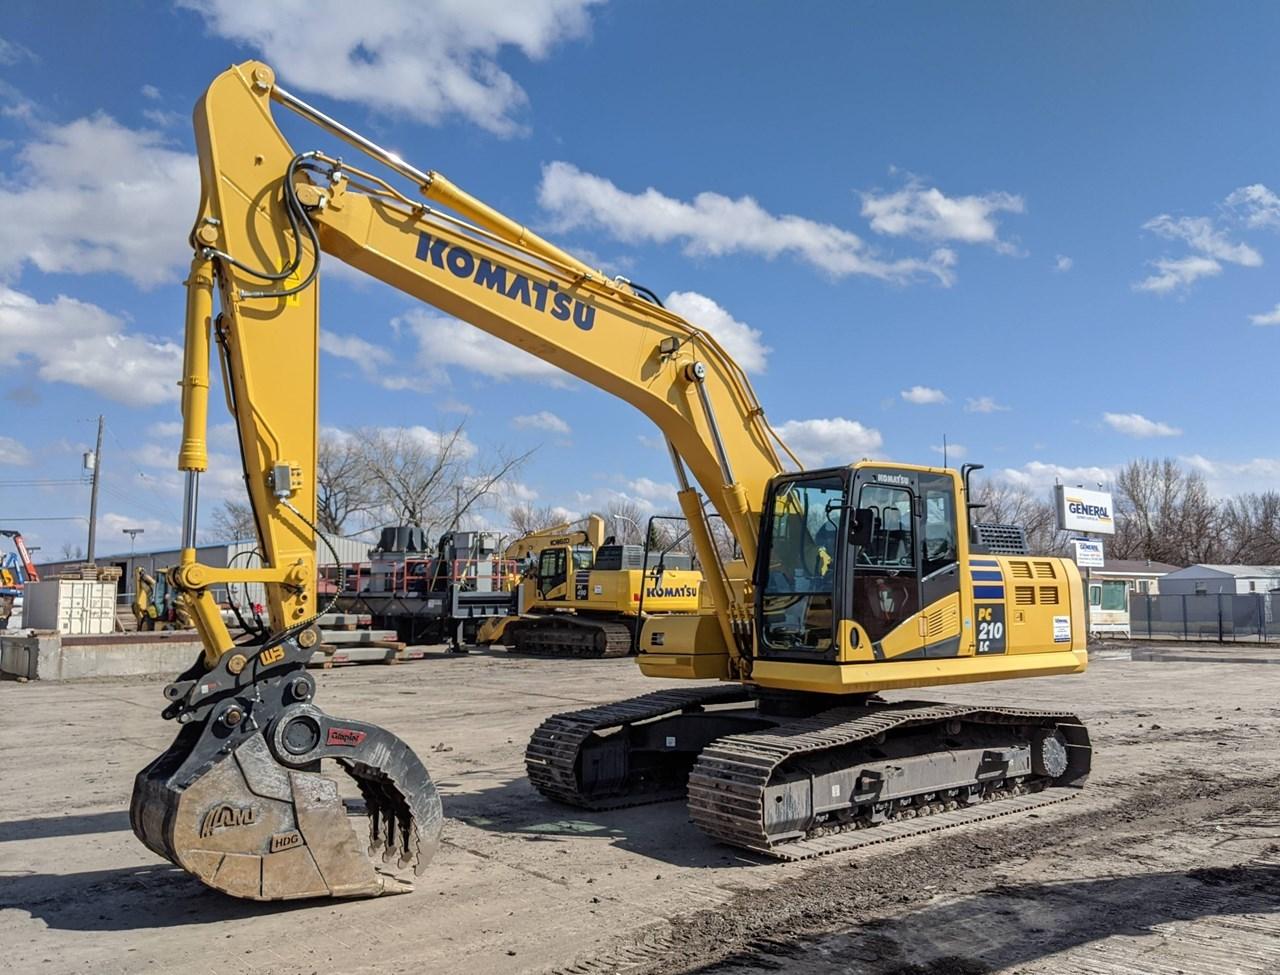 2017 Komatsu PC210LC-11 Excavator For Sale